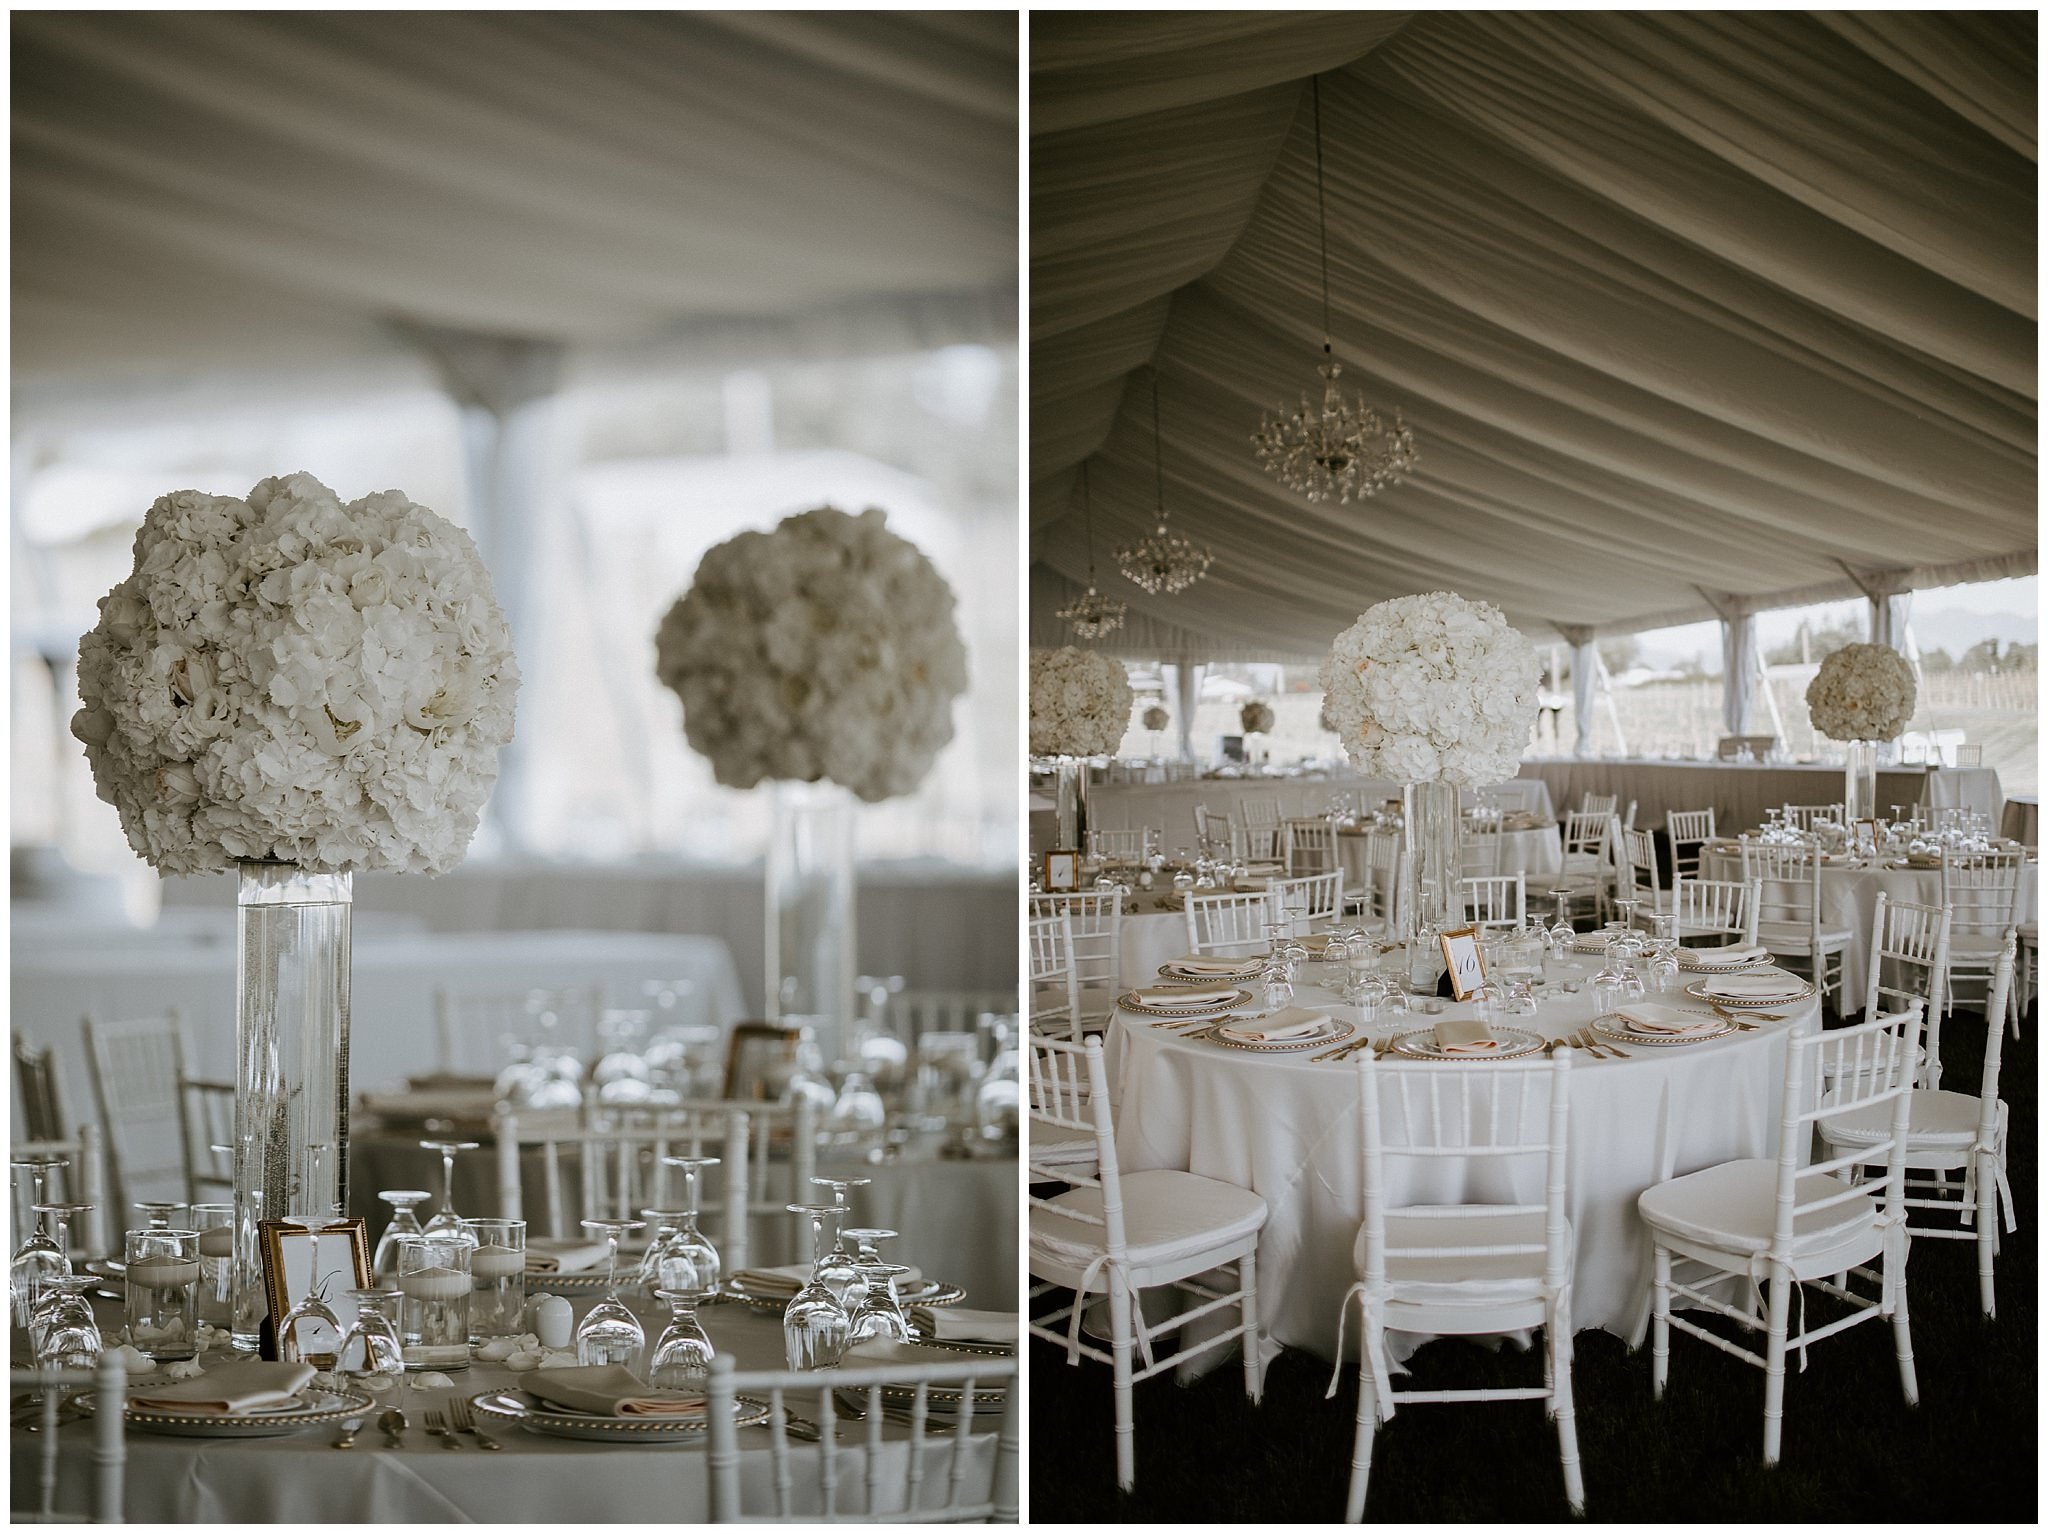 mt-lehman-winery-wedding-abbotsford-18.JPG